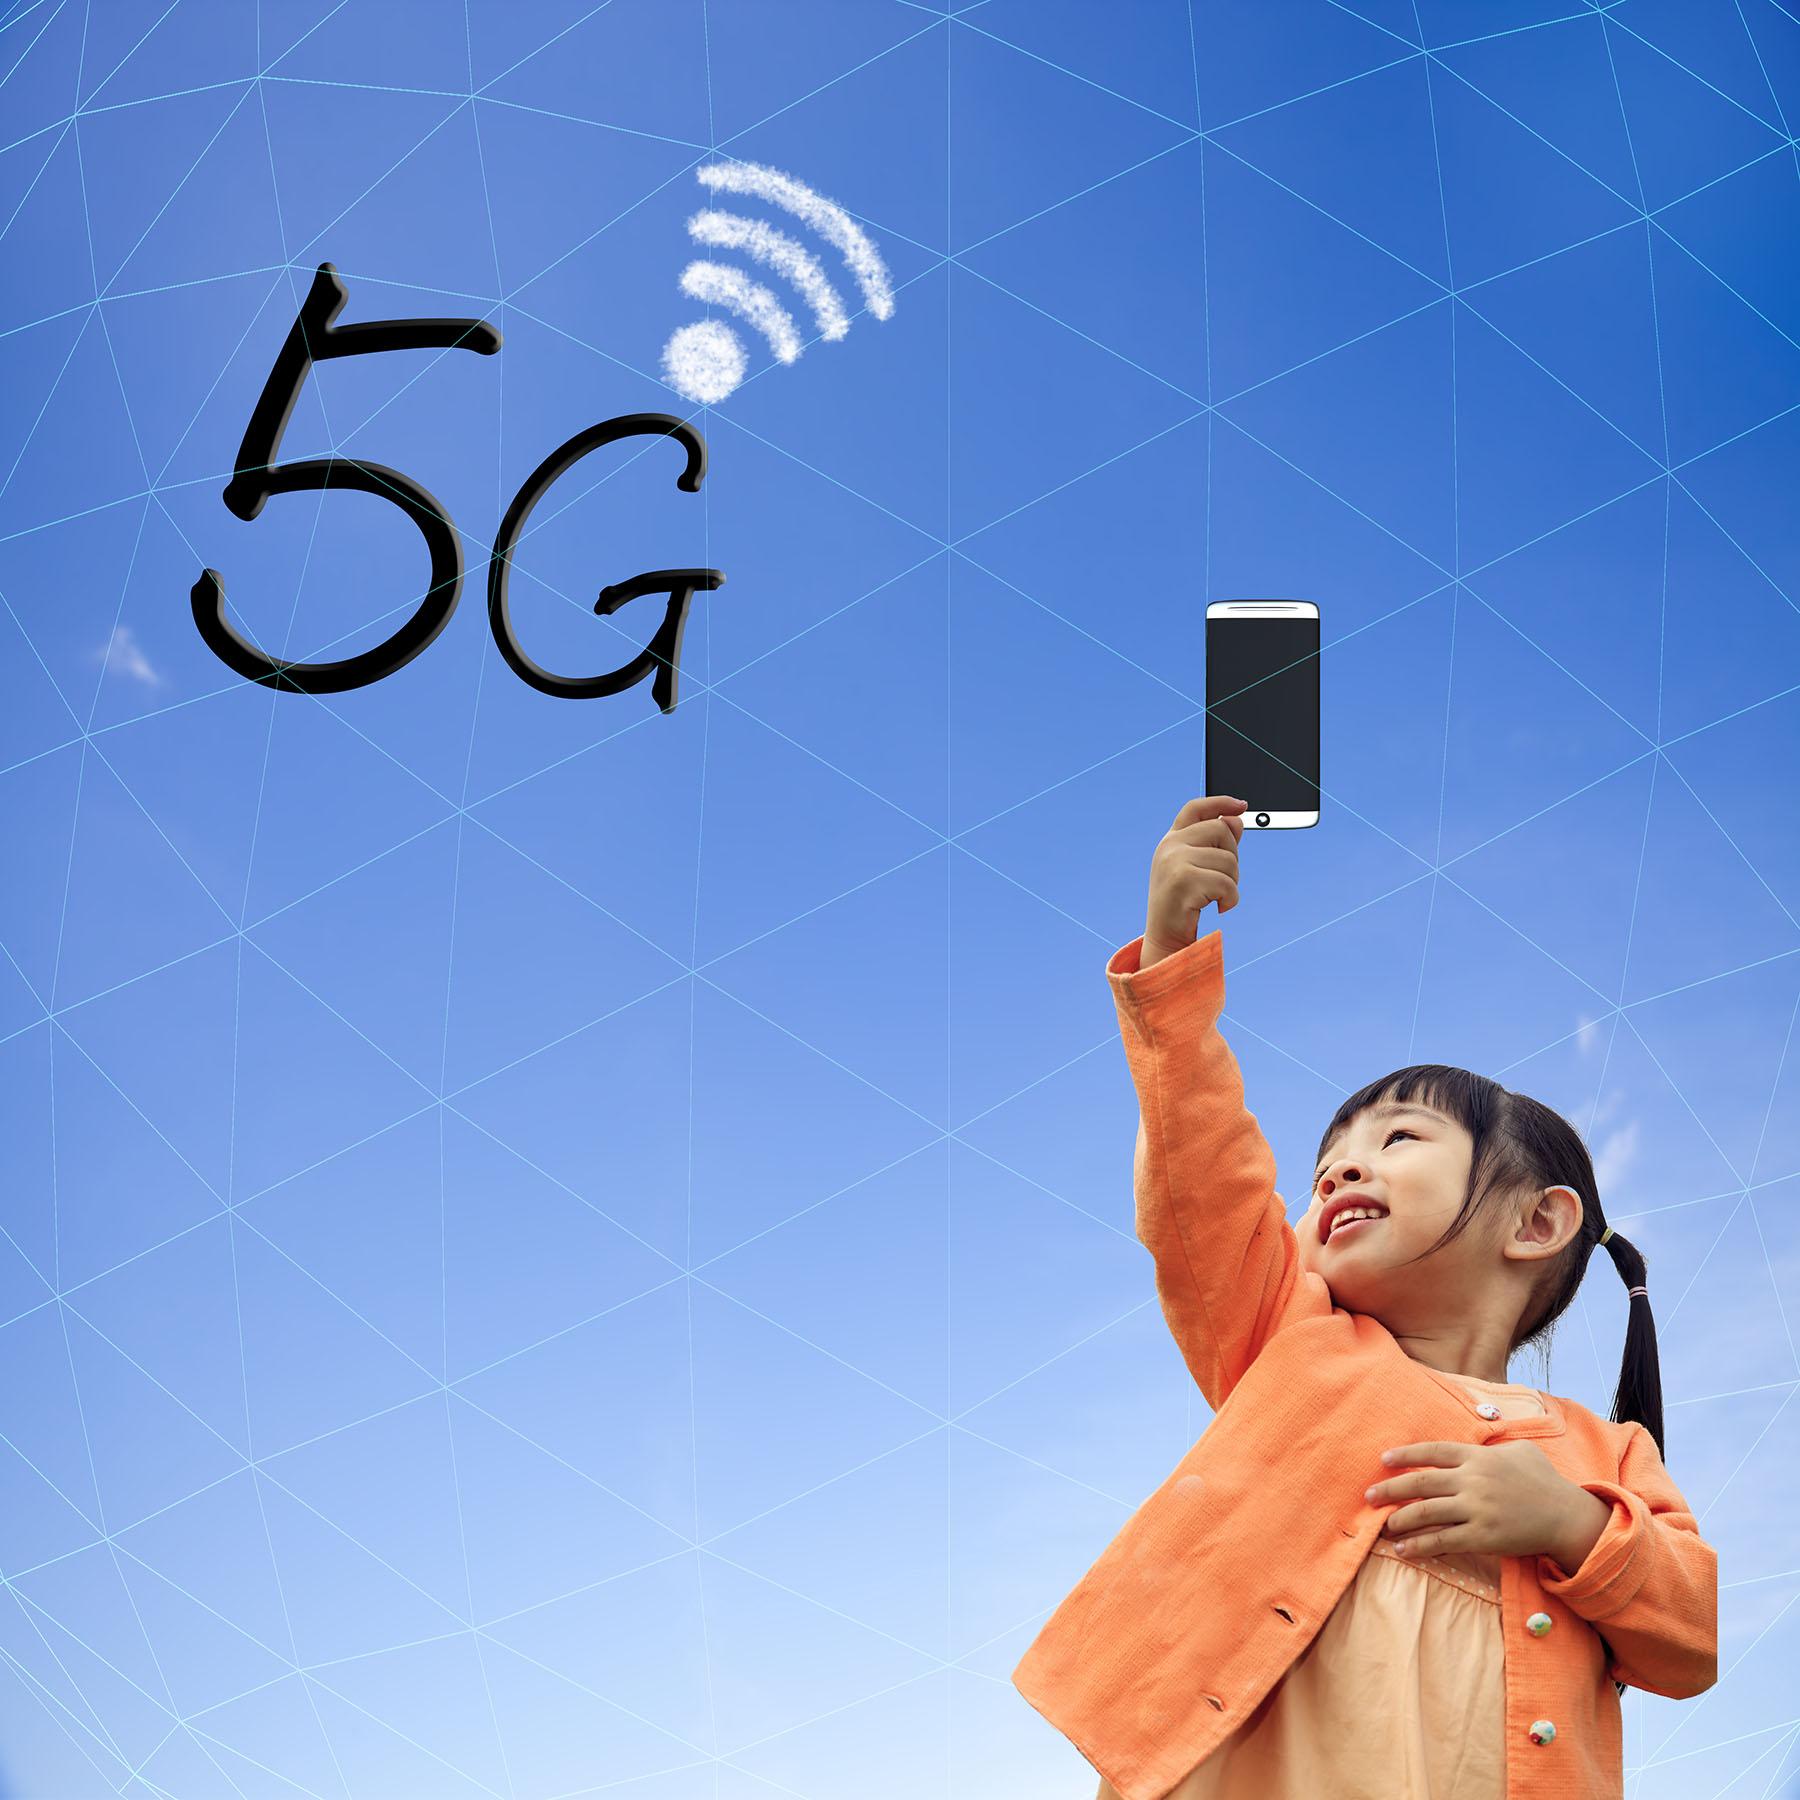 La Cina lancia la più grande rete 5G al mondo